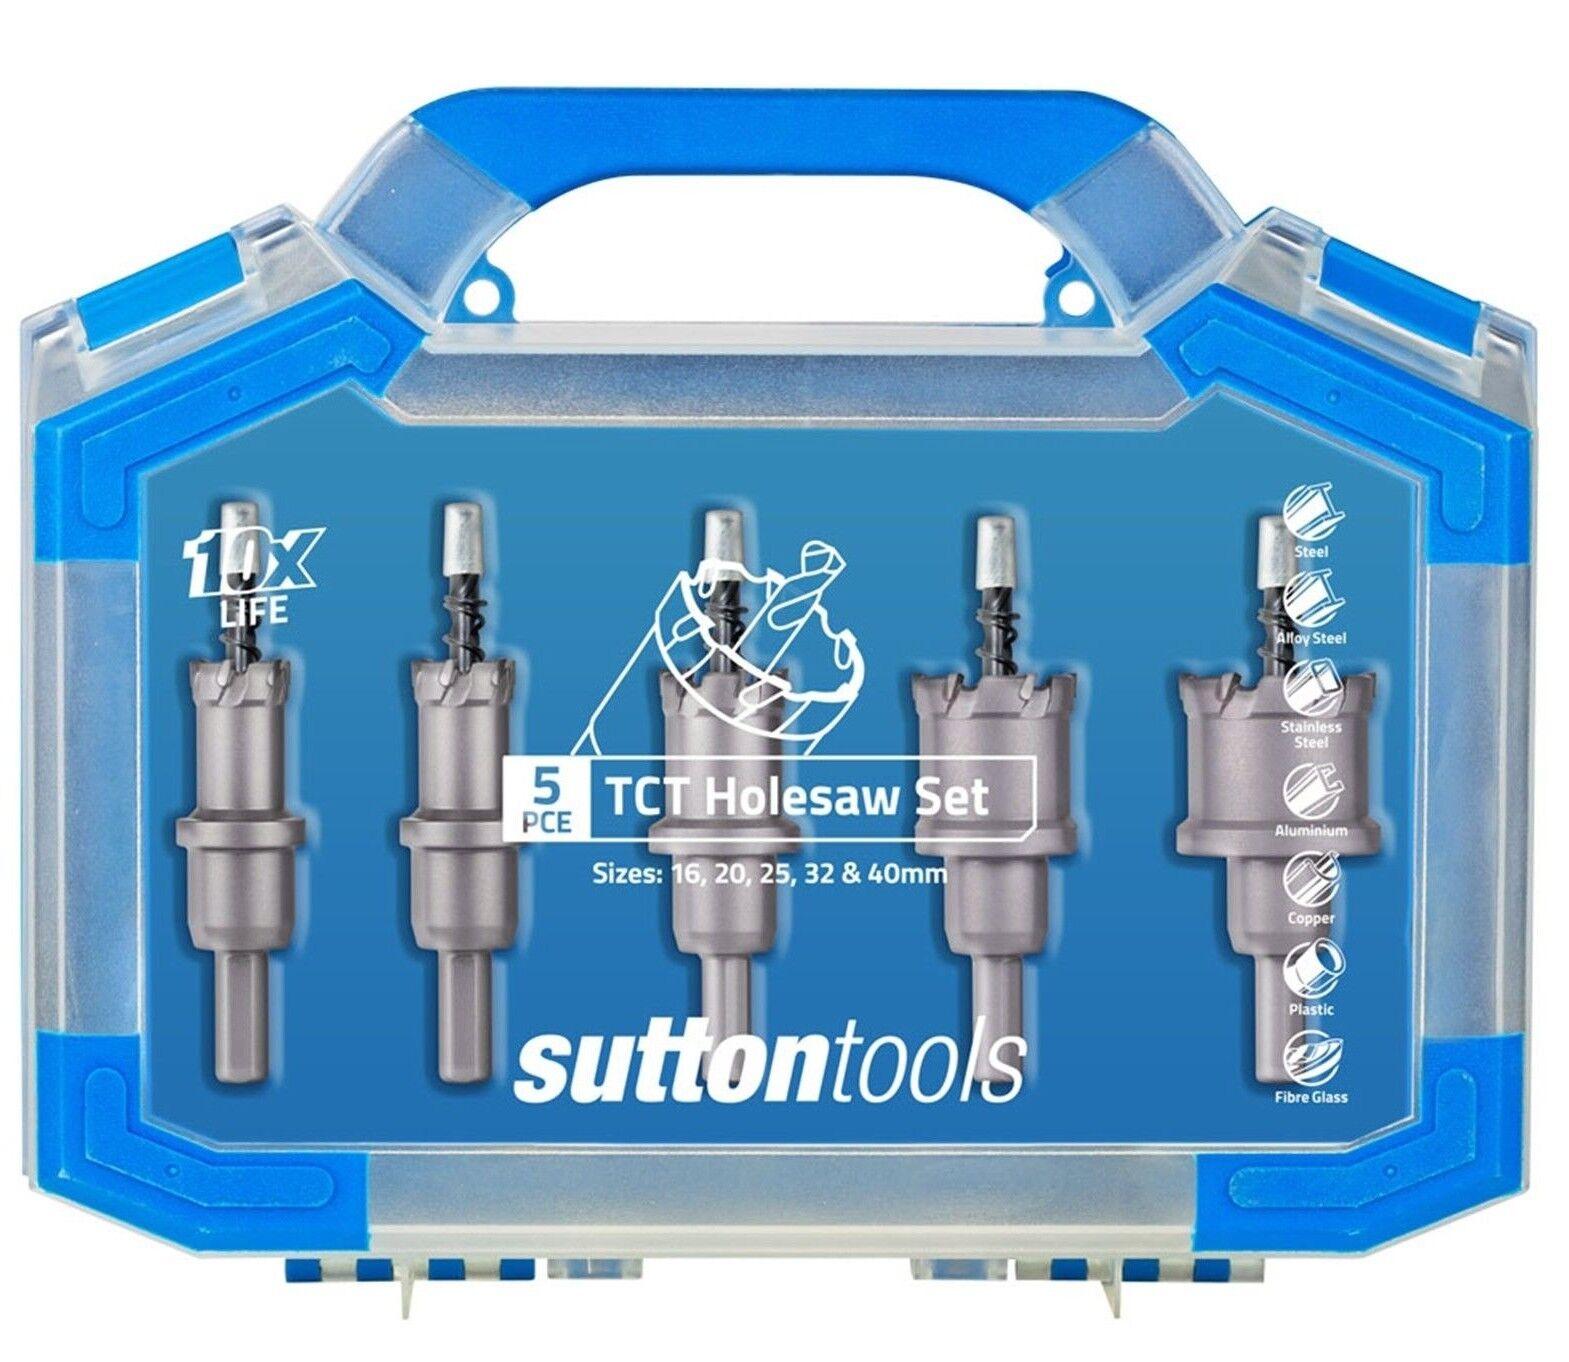 Sutton Tools 5-PIECE TCT HOLESAW SET H1170005 16,20,25,32 & 40mm, 3-Flat Shank